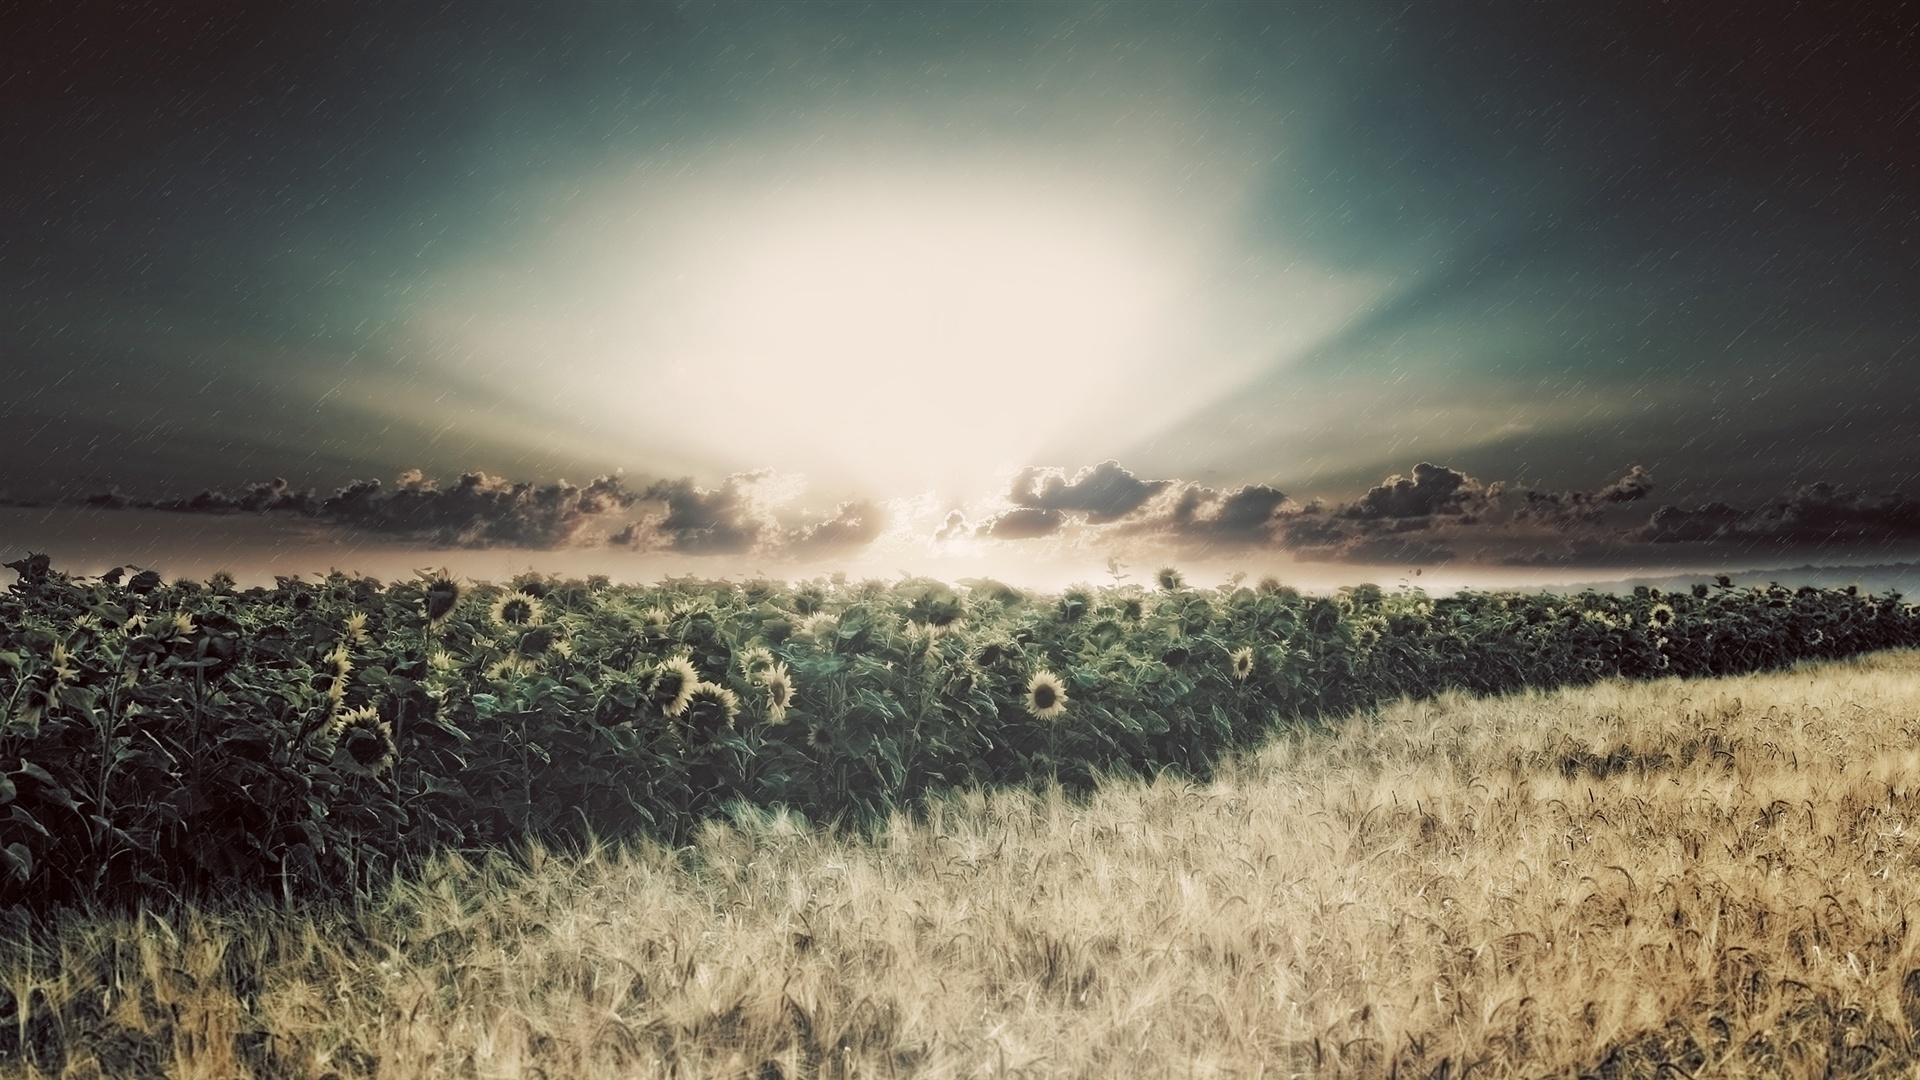 Download Wallpaper 1920x1080 Sunflowers Fields Rain